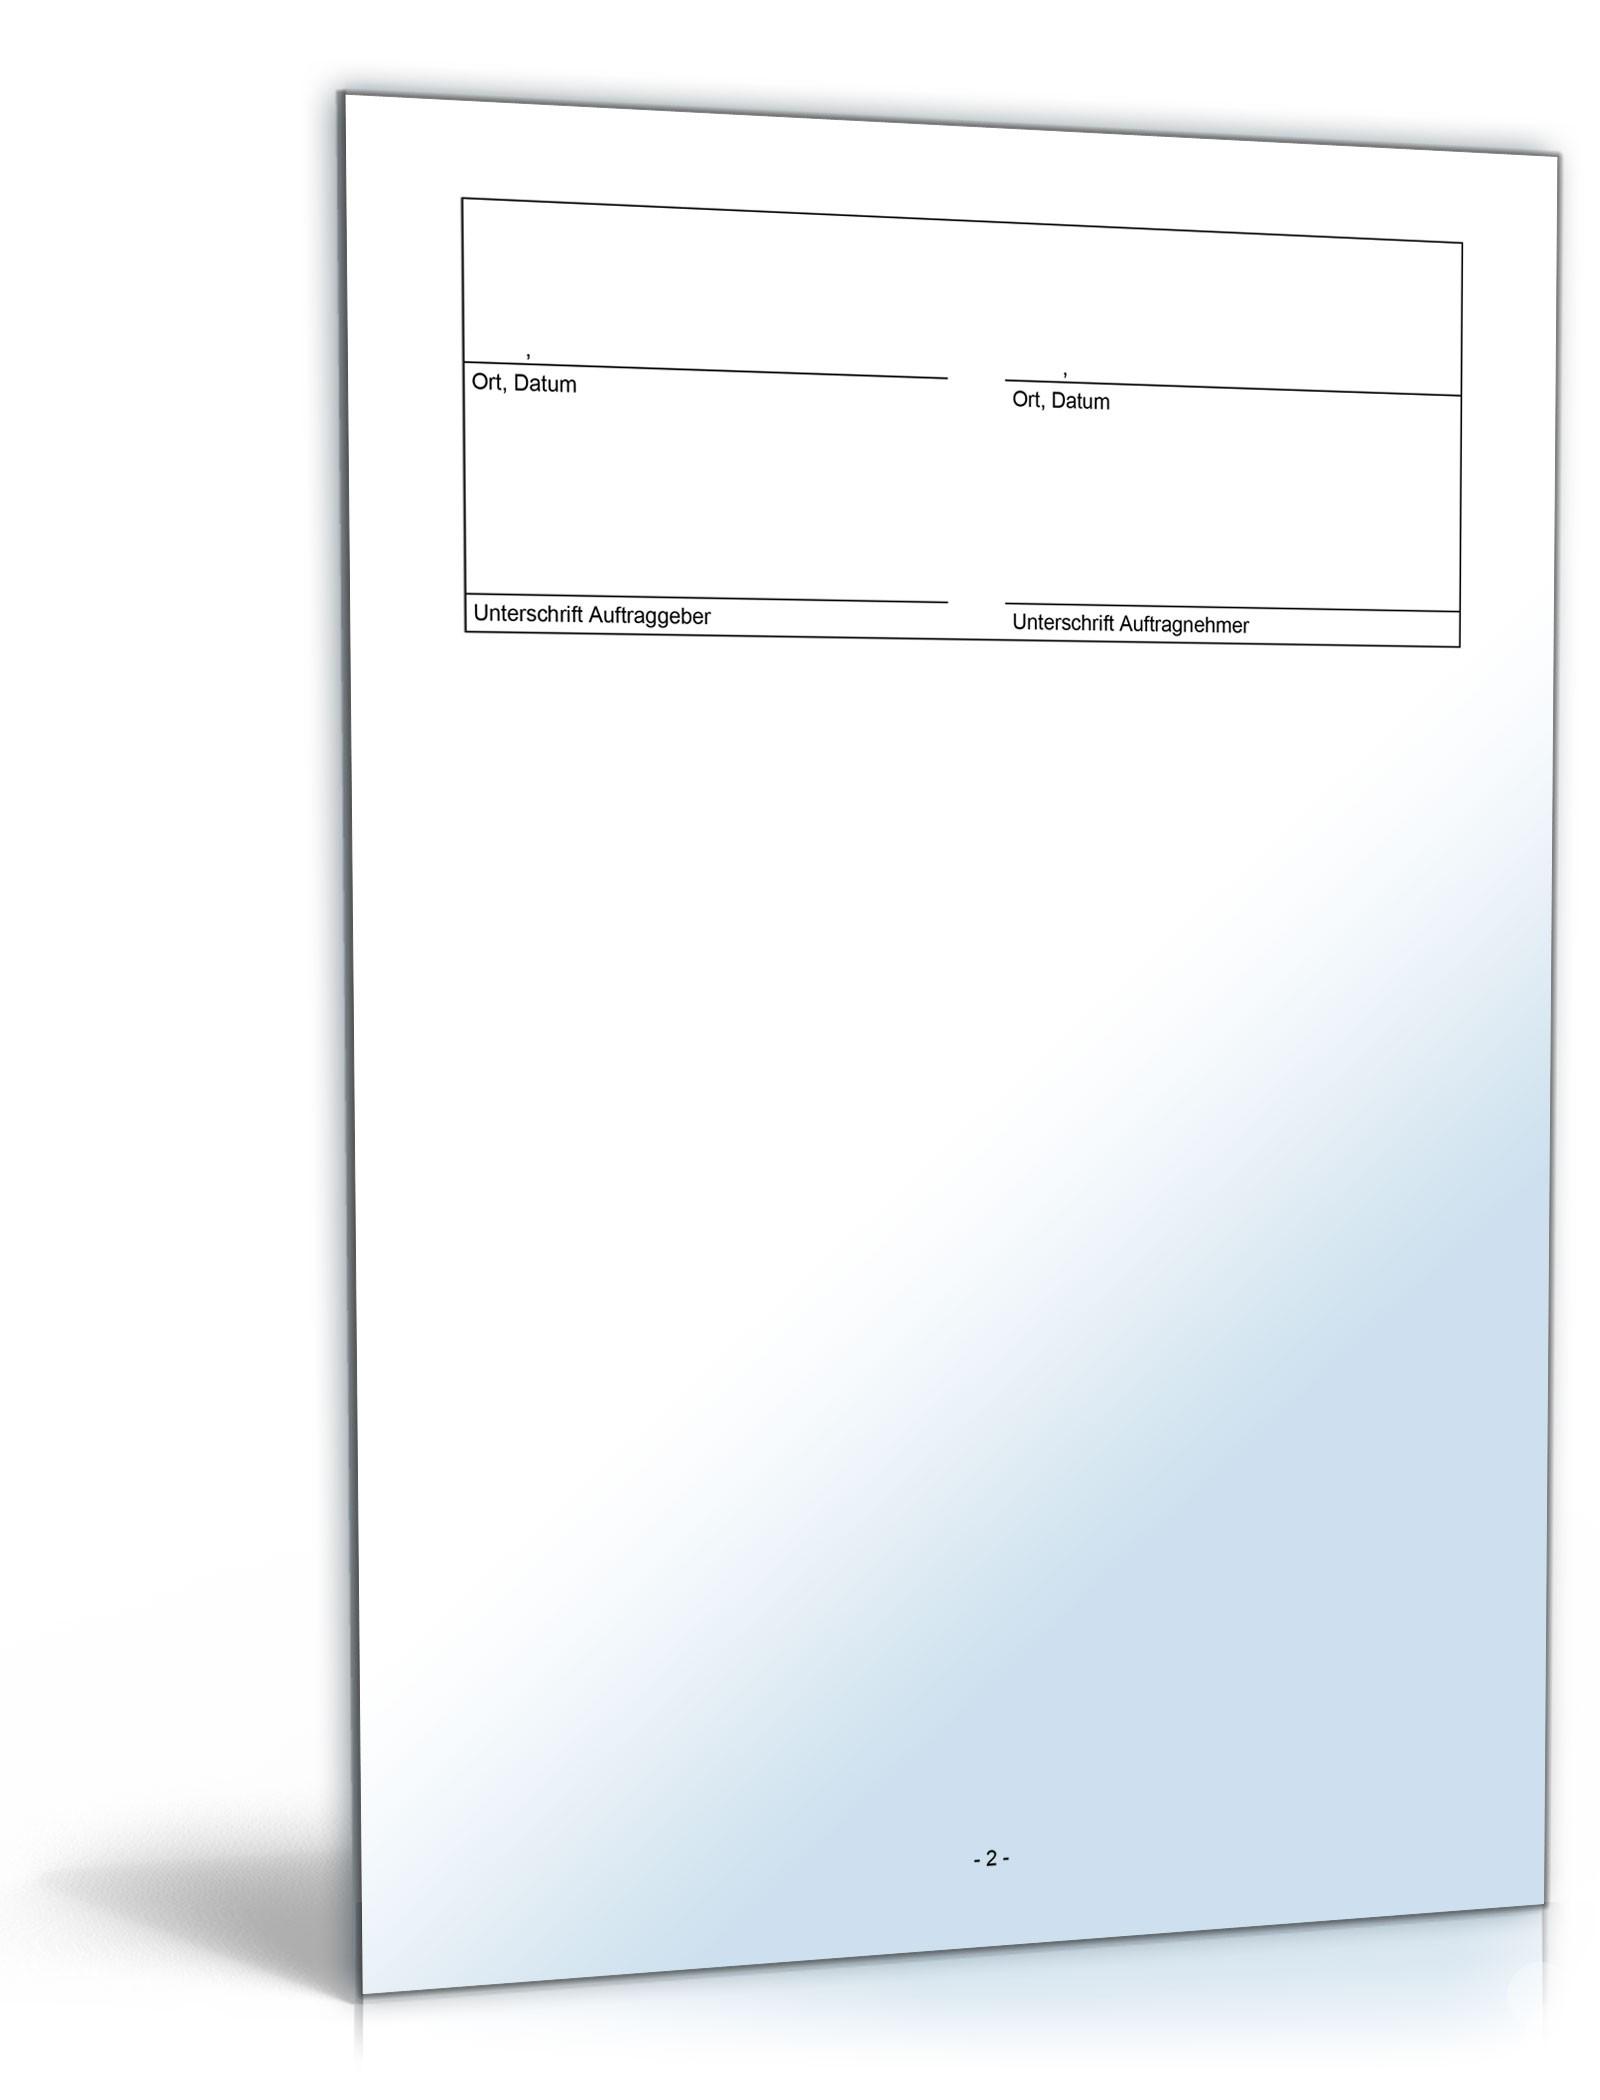 vob b bauvertrag globalpauschalpreisvertrag vorlage zum download. Black Bedroom Furniture Sets. Home Design Ideas